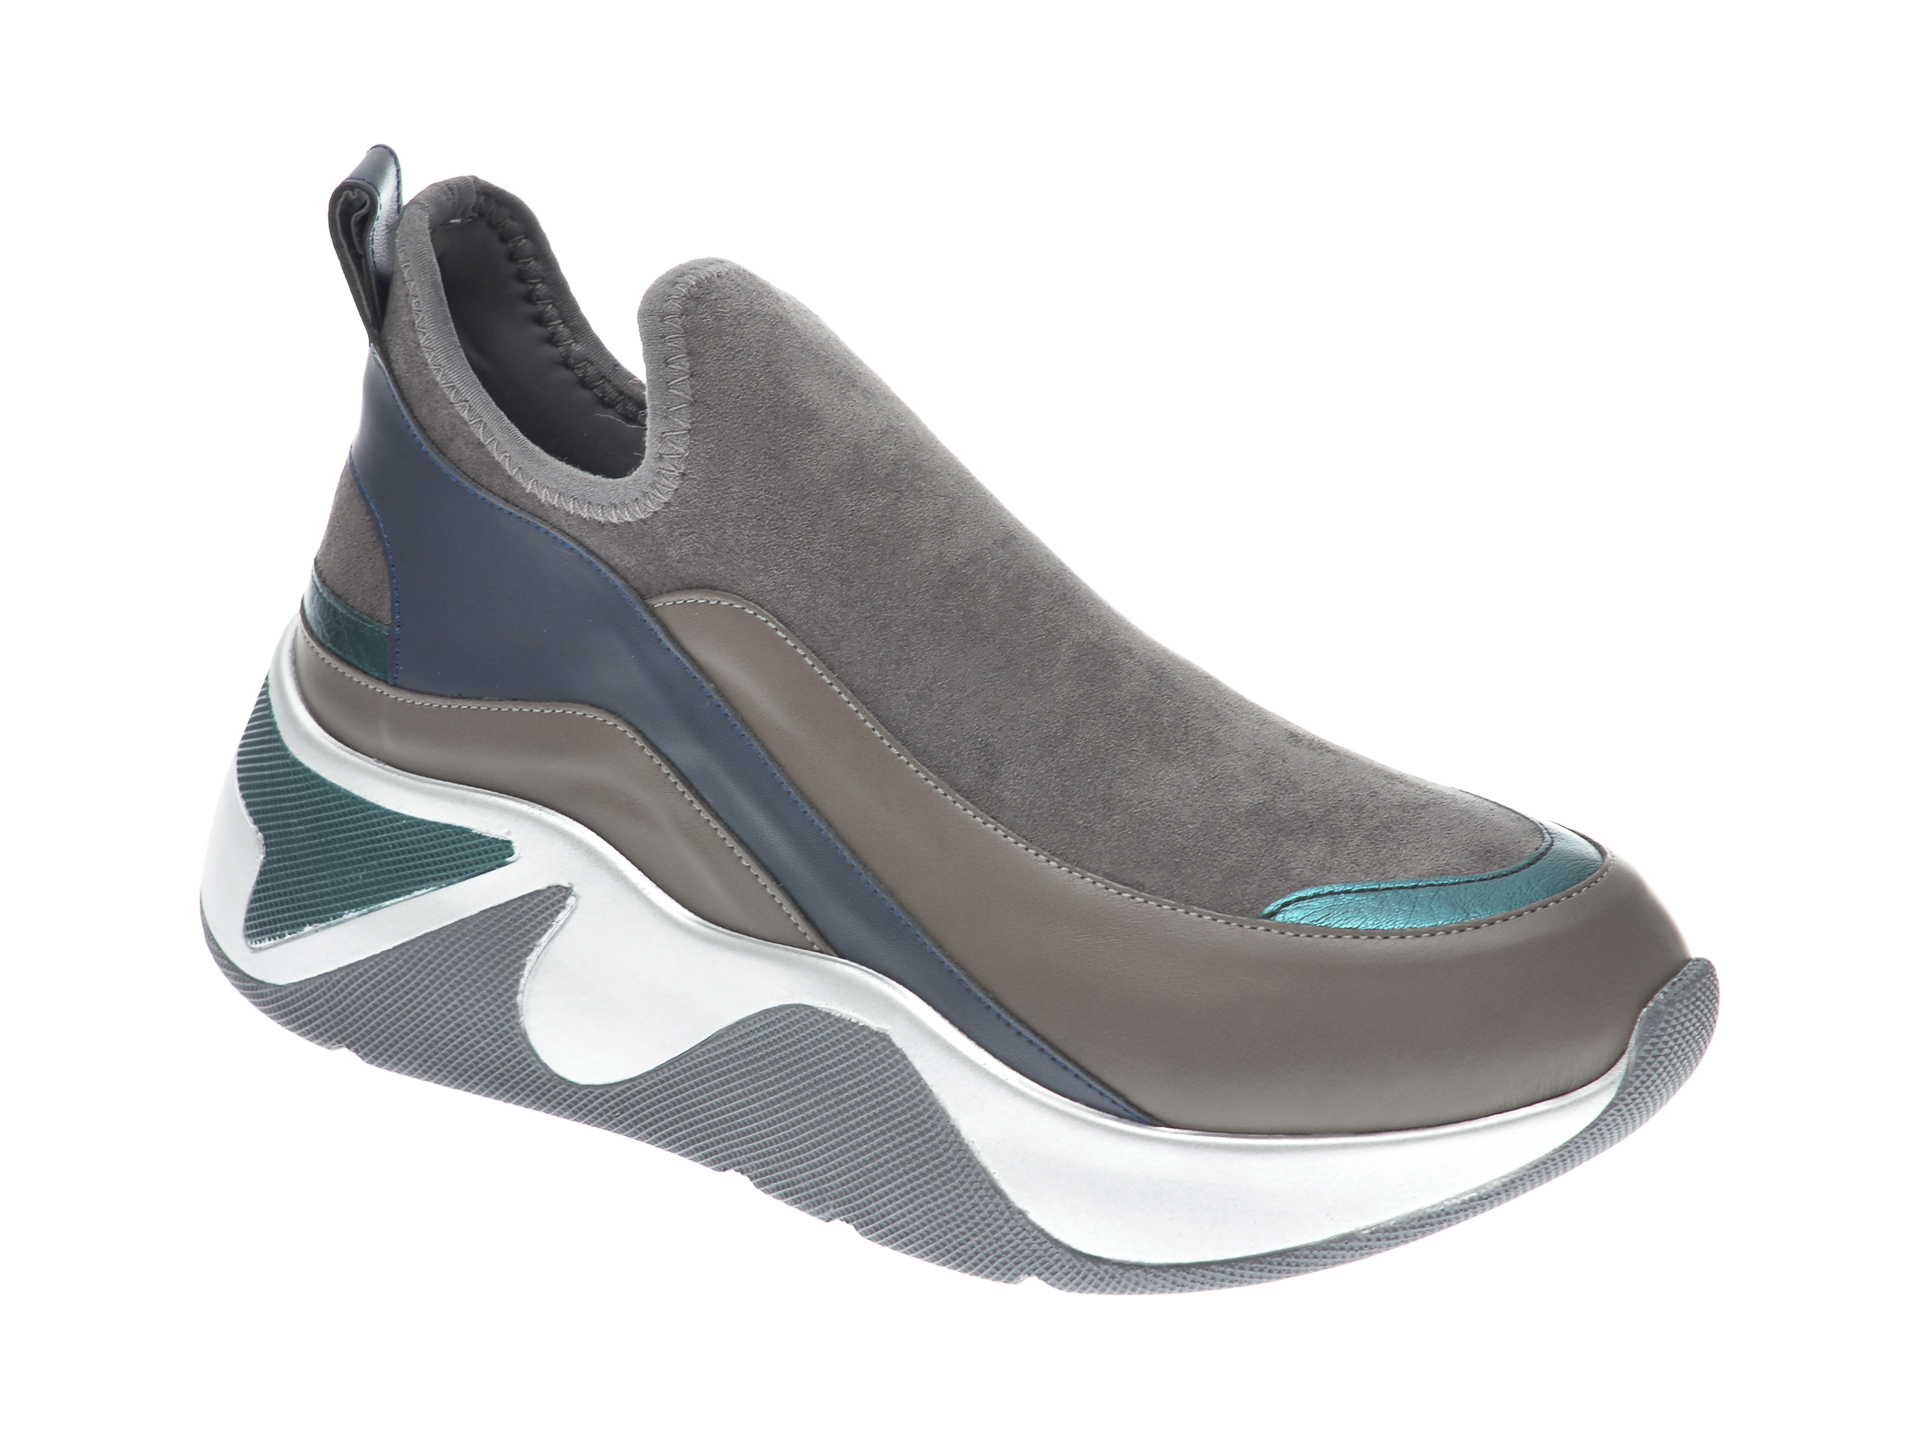 Pantofi sport GRYXX gri, MK115, din piele ecologica imagine